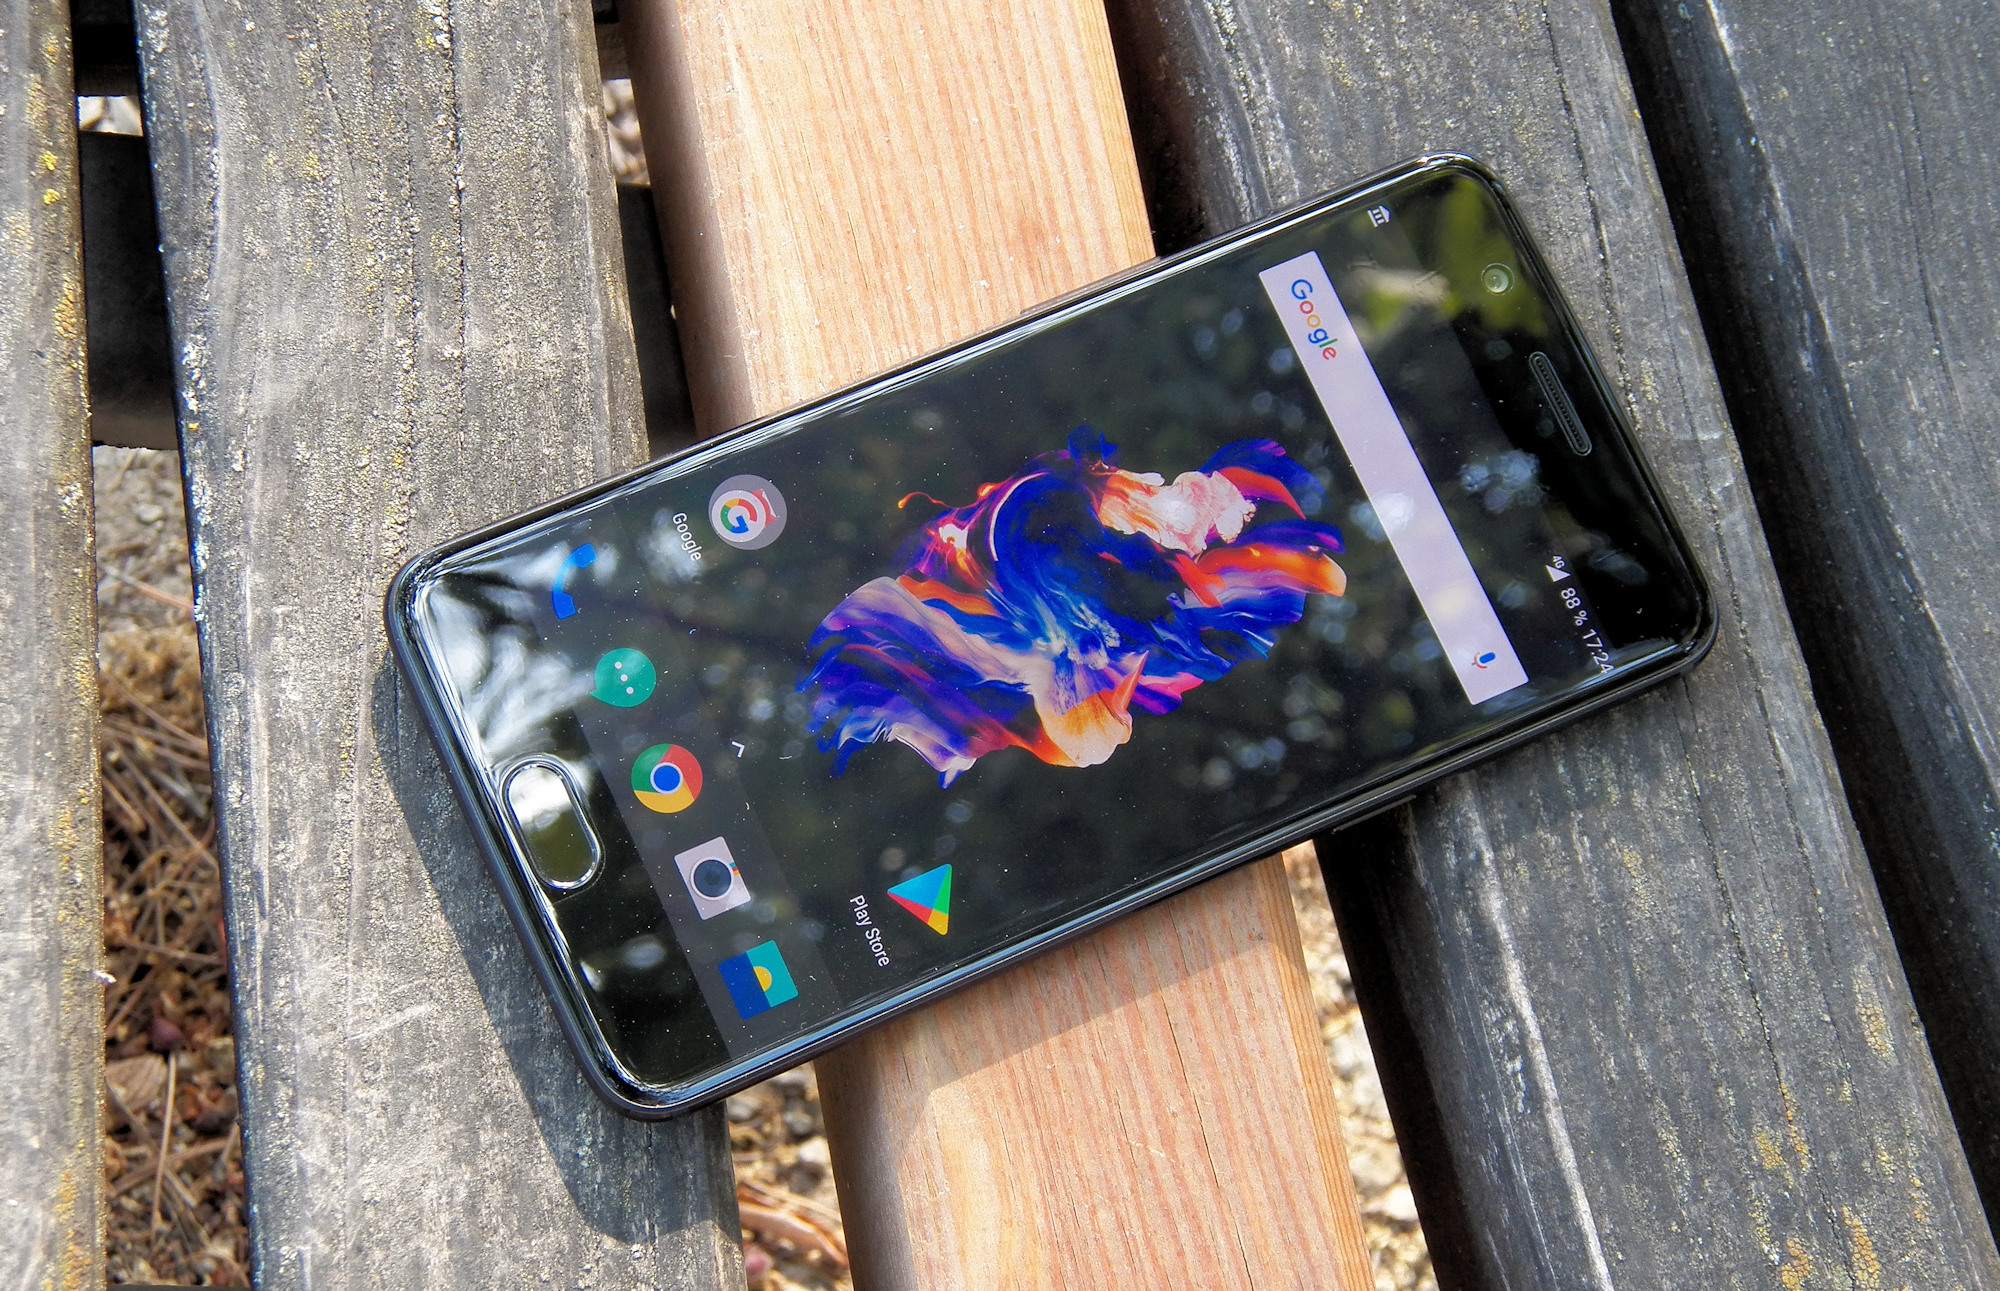 smartphones-one-plus-5-im-test-starkes-android-flaggschiff-im-iphone-gewand